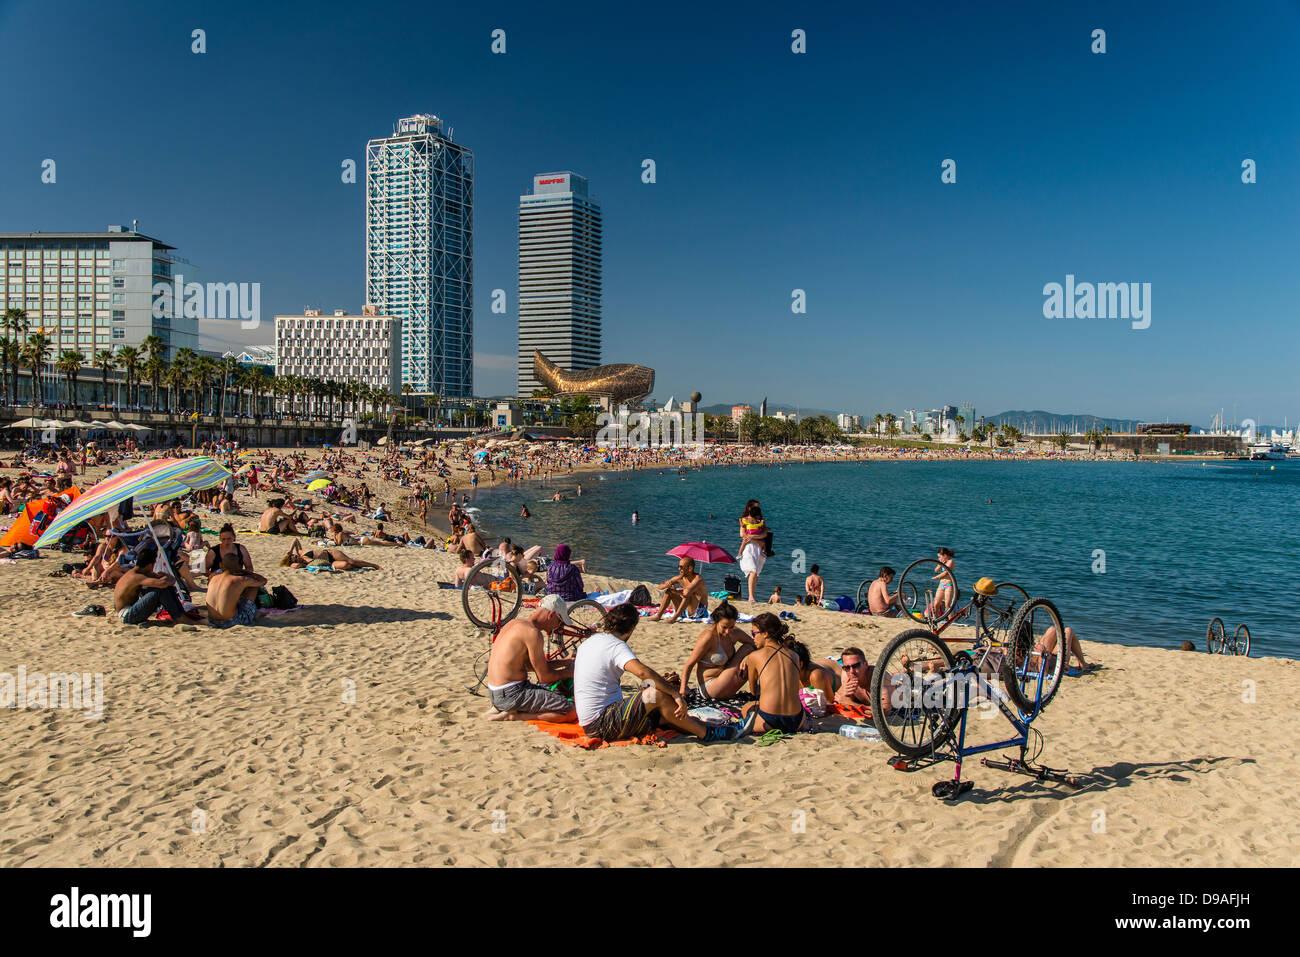 Sunbathers at Somorrostro beach, Barcelona, Catalonia, Spain - Stock Image